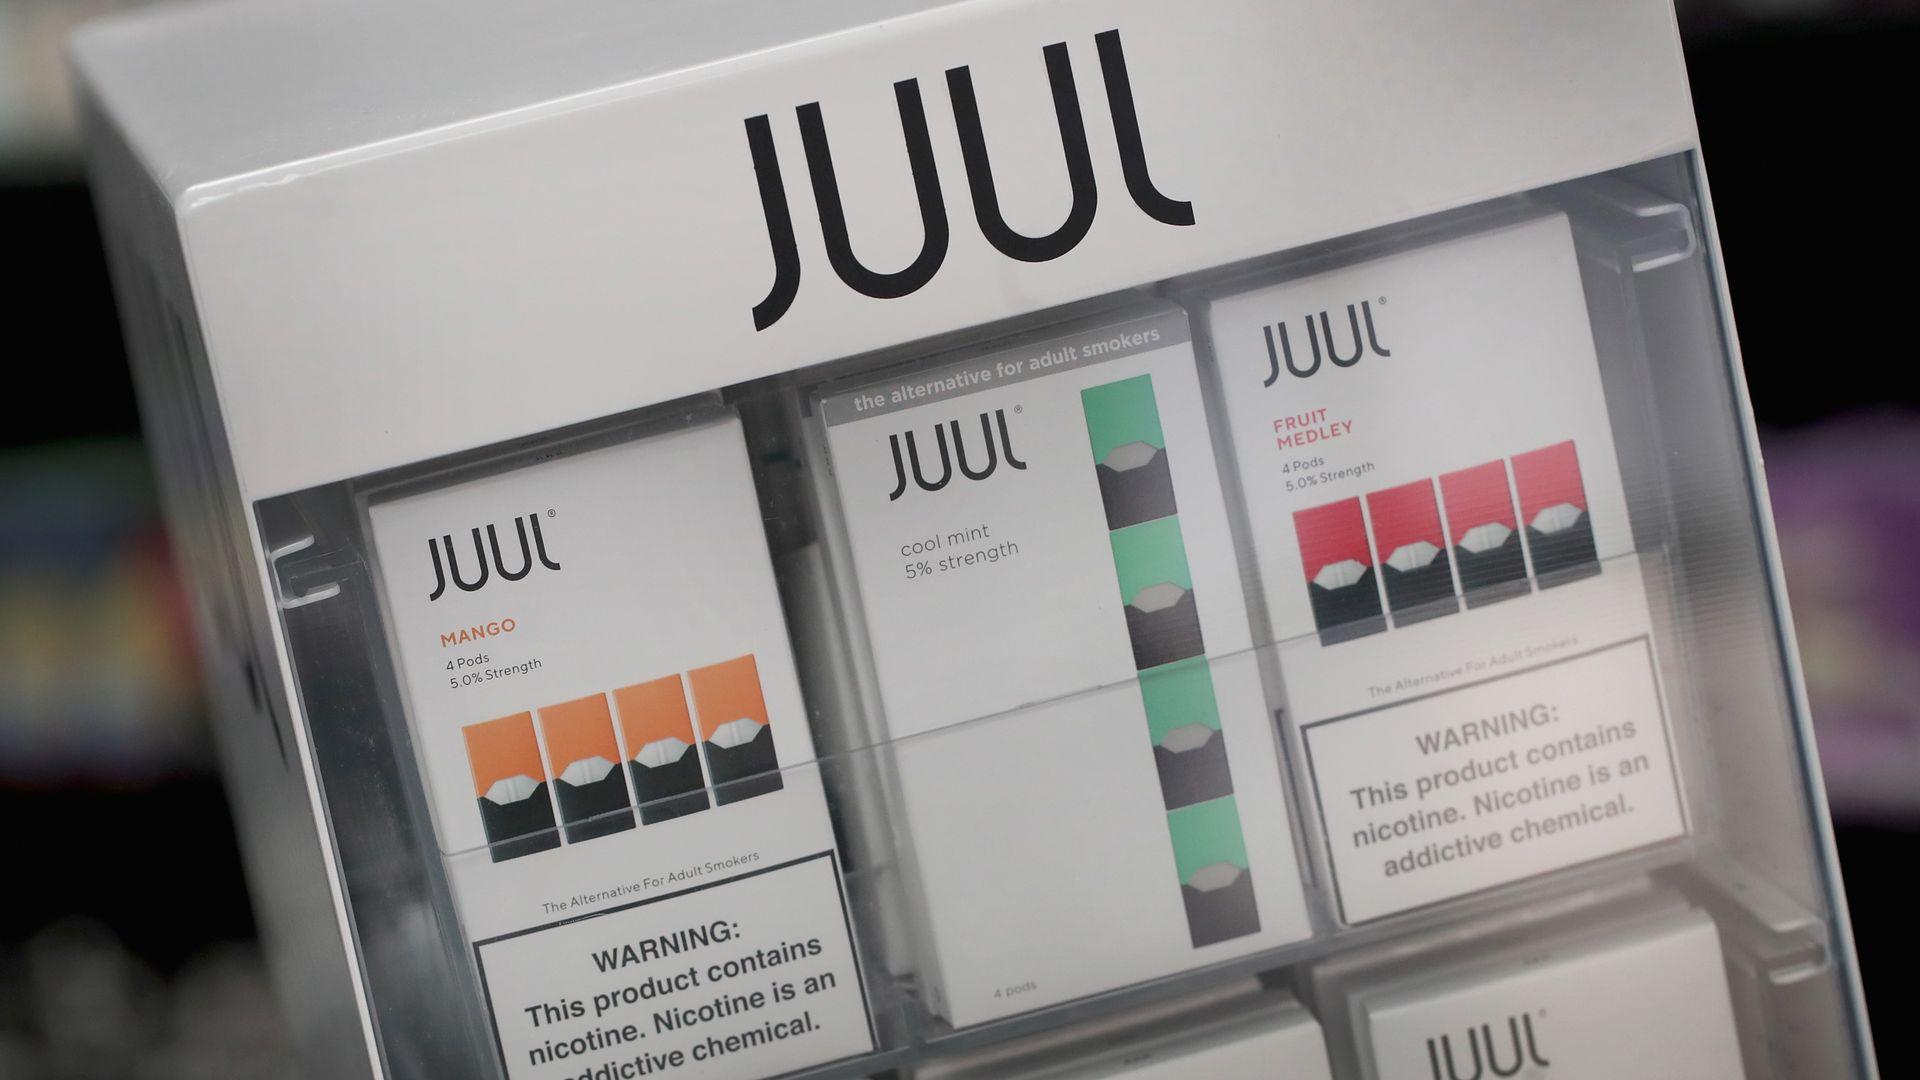 Juul files patent infringement complaint on other vape